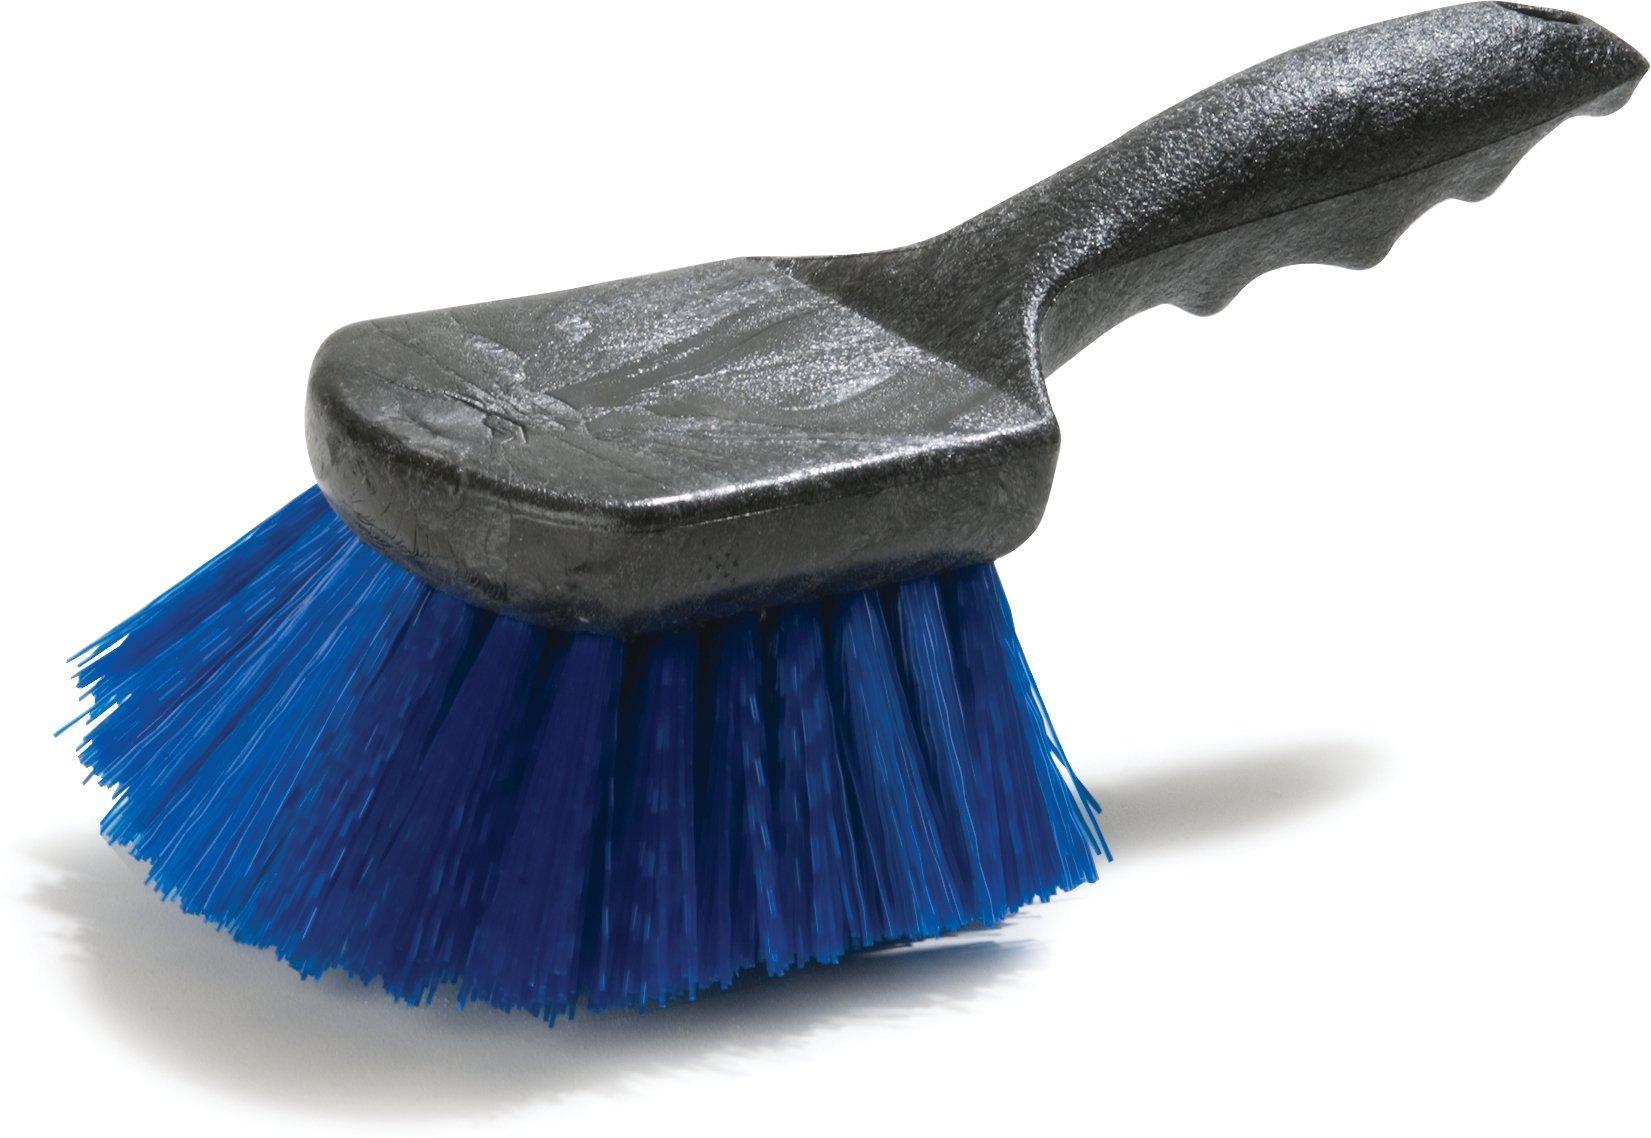 Carlisle 3650514 Sparta Plastic Block Utility Scrub Brush, Polypropylene Bristles, 2'' Bristle Trim, 8-1/2'' Length x 3'' Width, Blue (Case of 12)